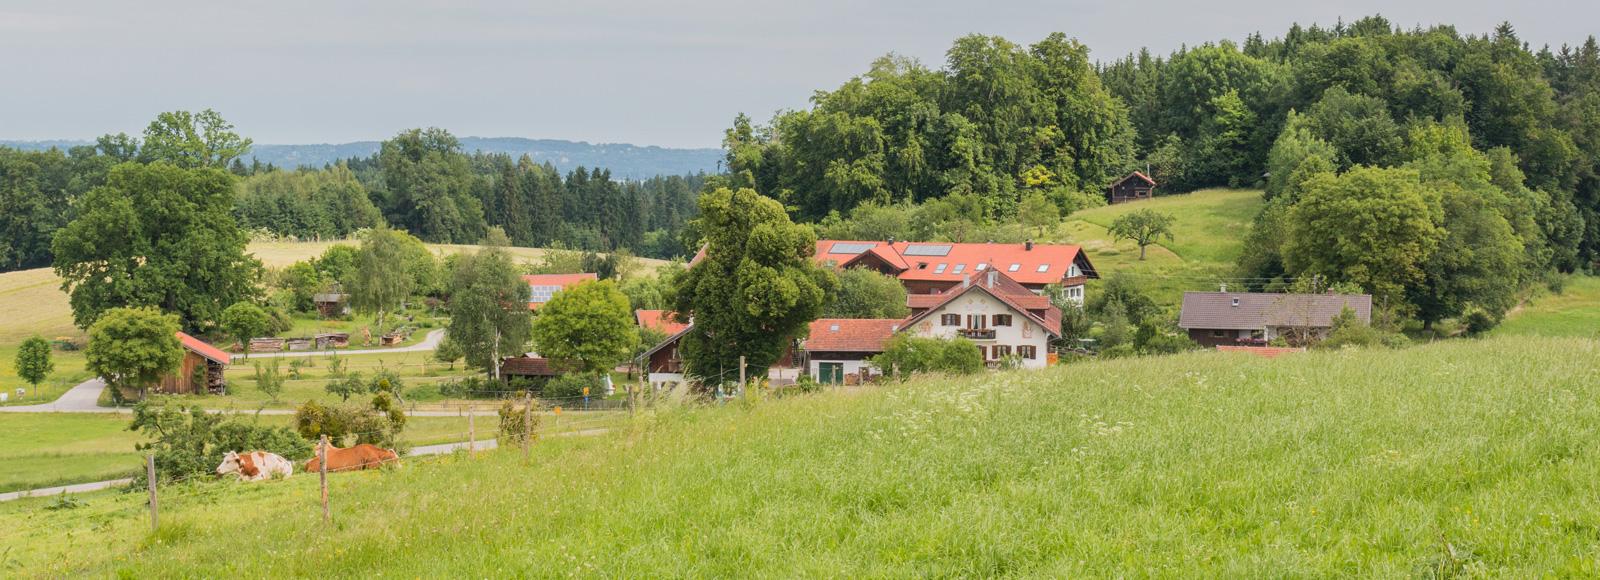 Mesnerhof vom Kirchberg